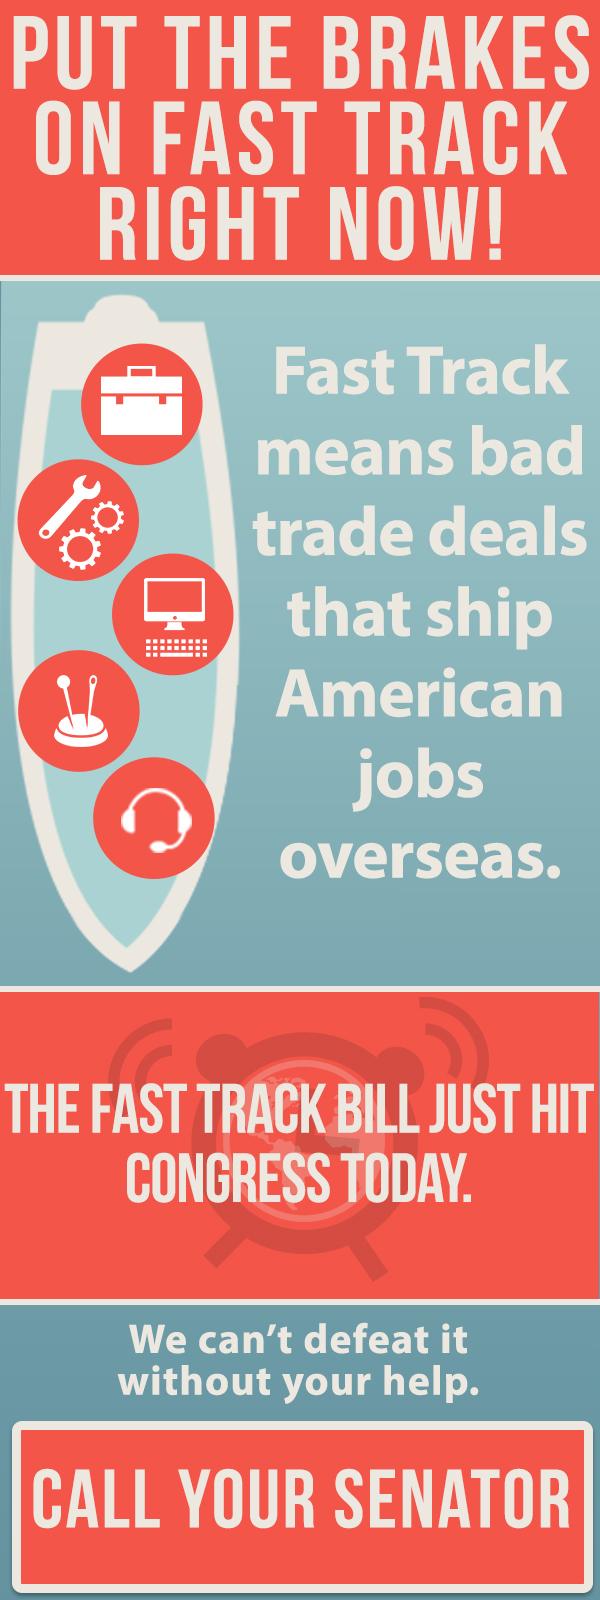 AFL-CIO Campaign to STOP FAST TRACK